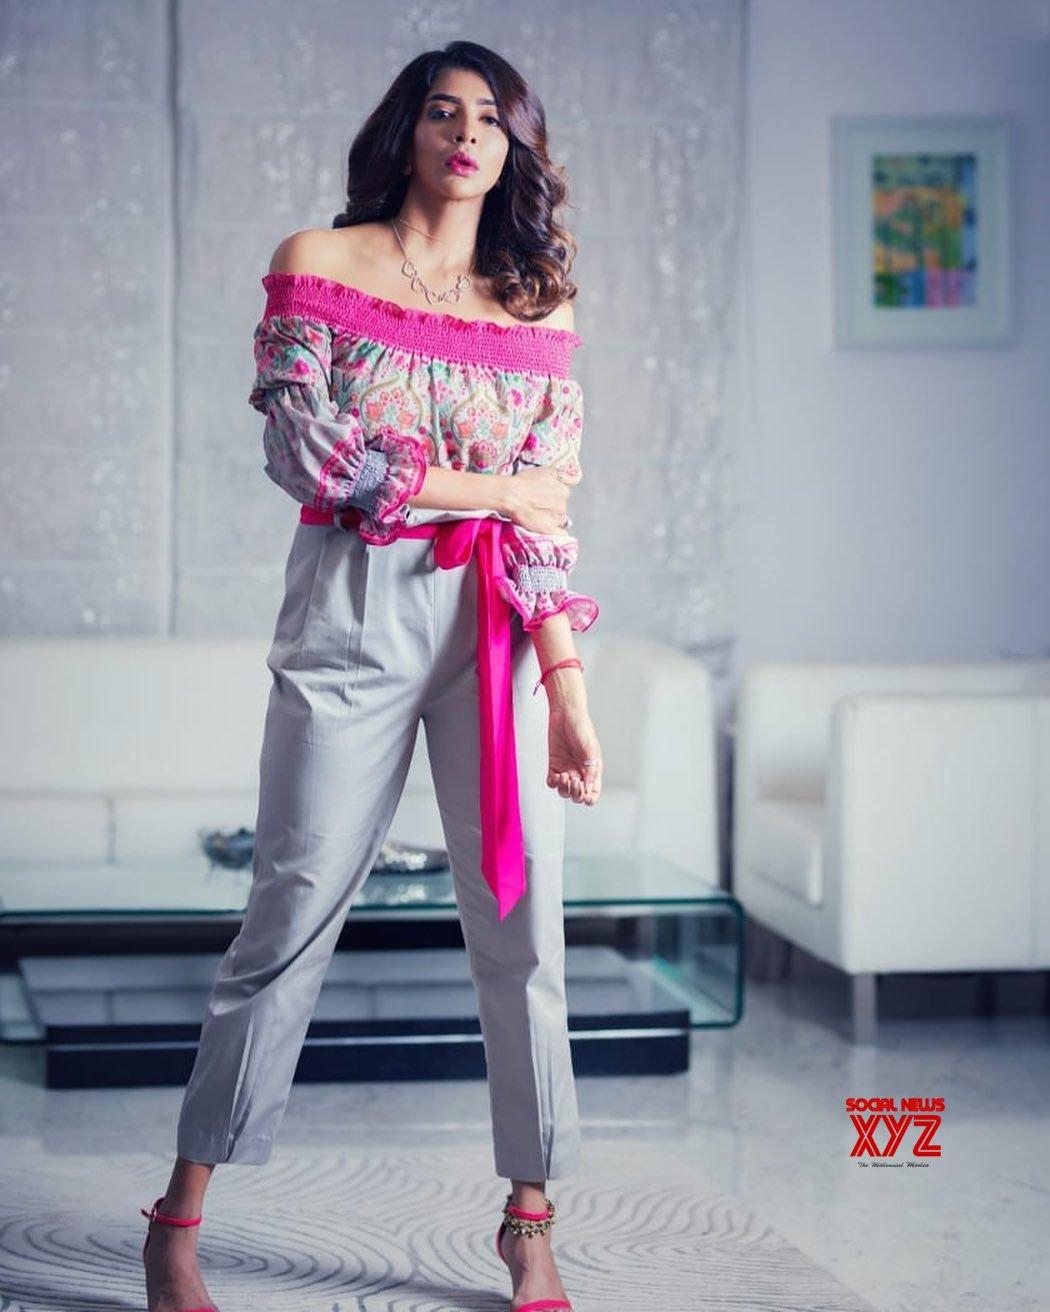 Actress Lakshmi Manchu Stills From Feet Up With The Stars Show